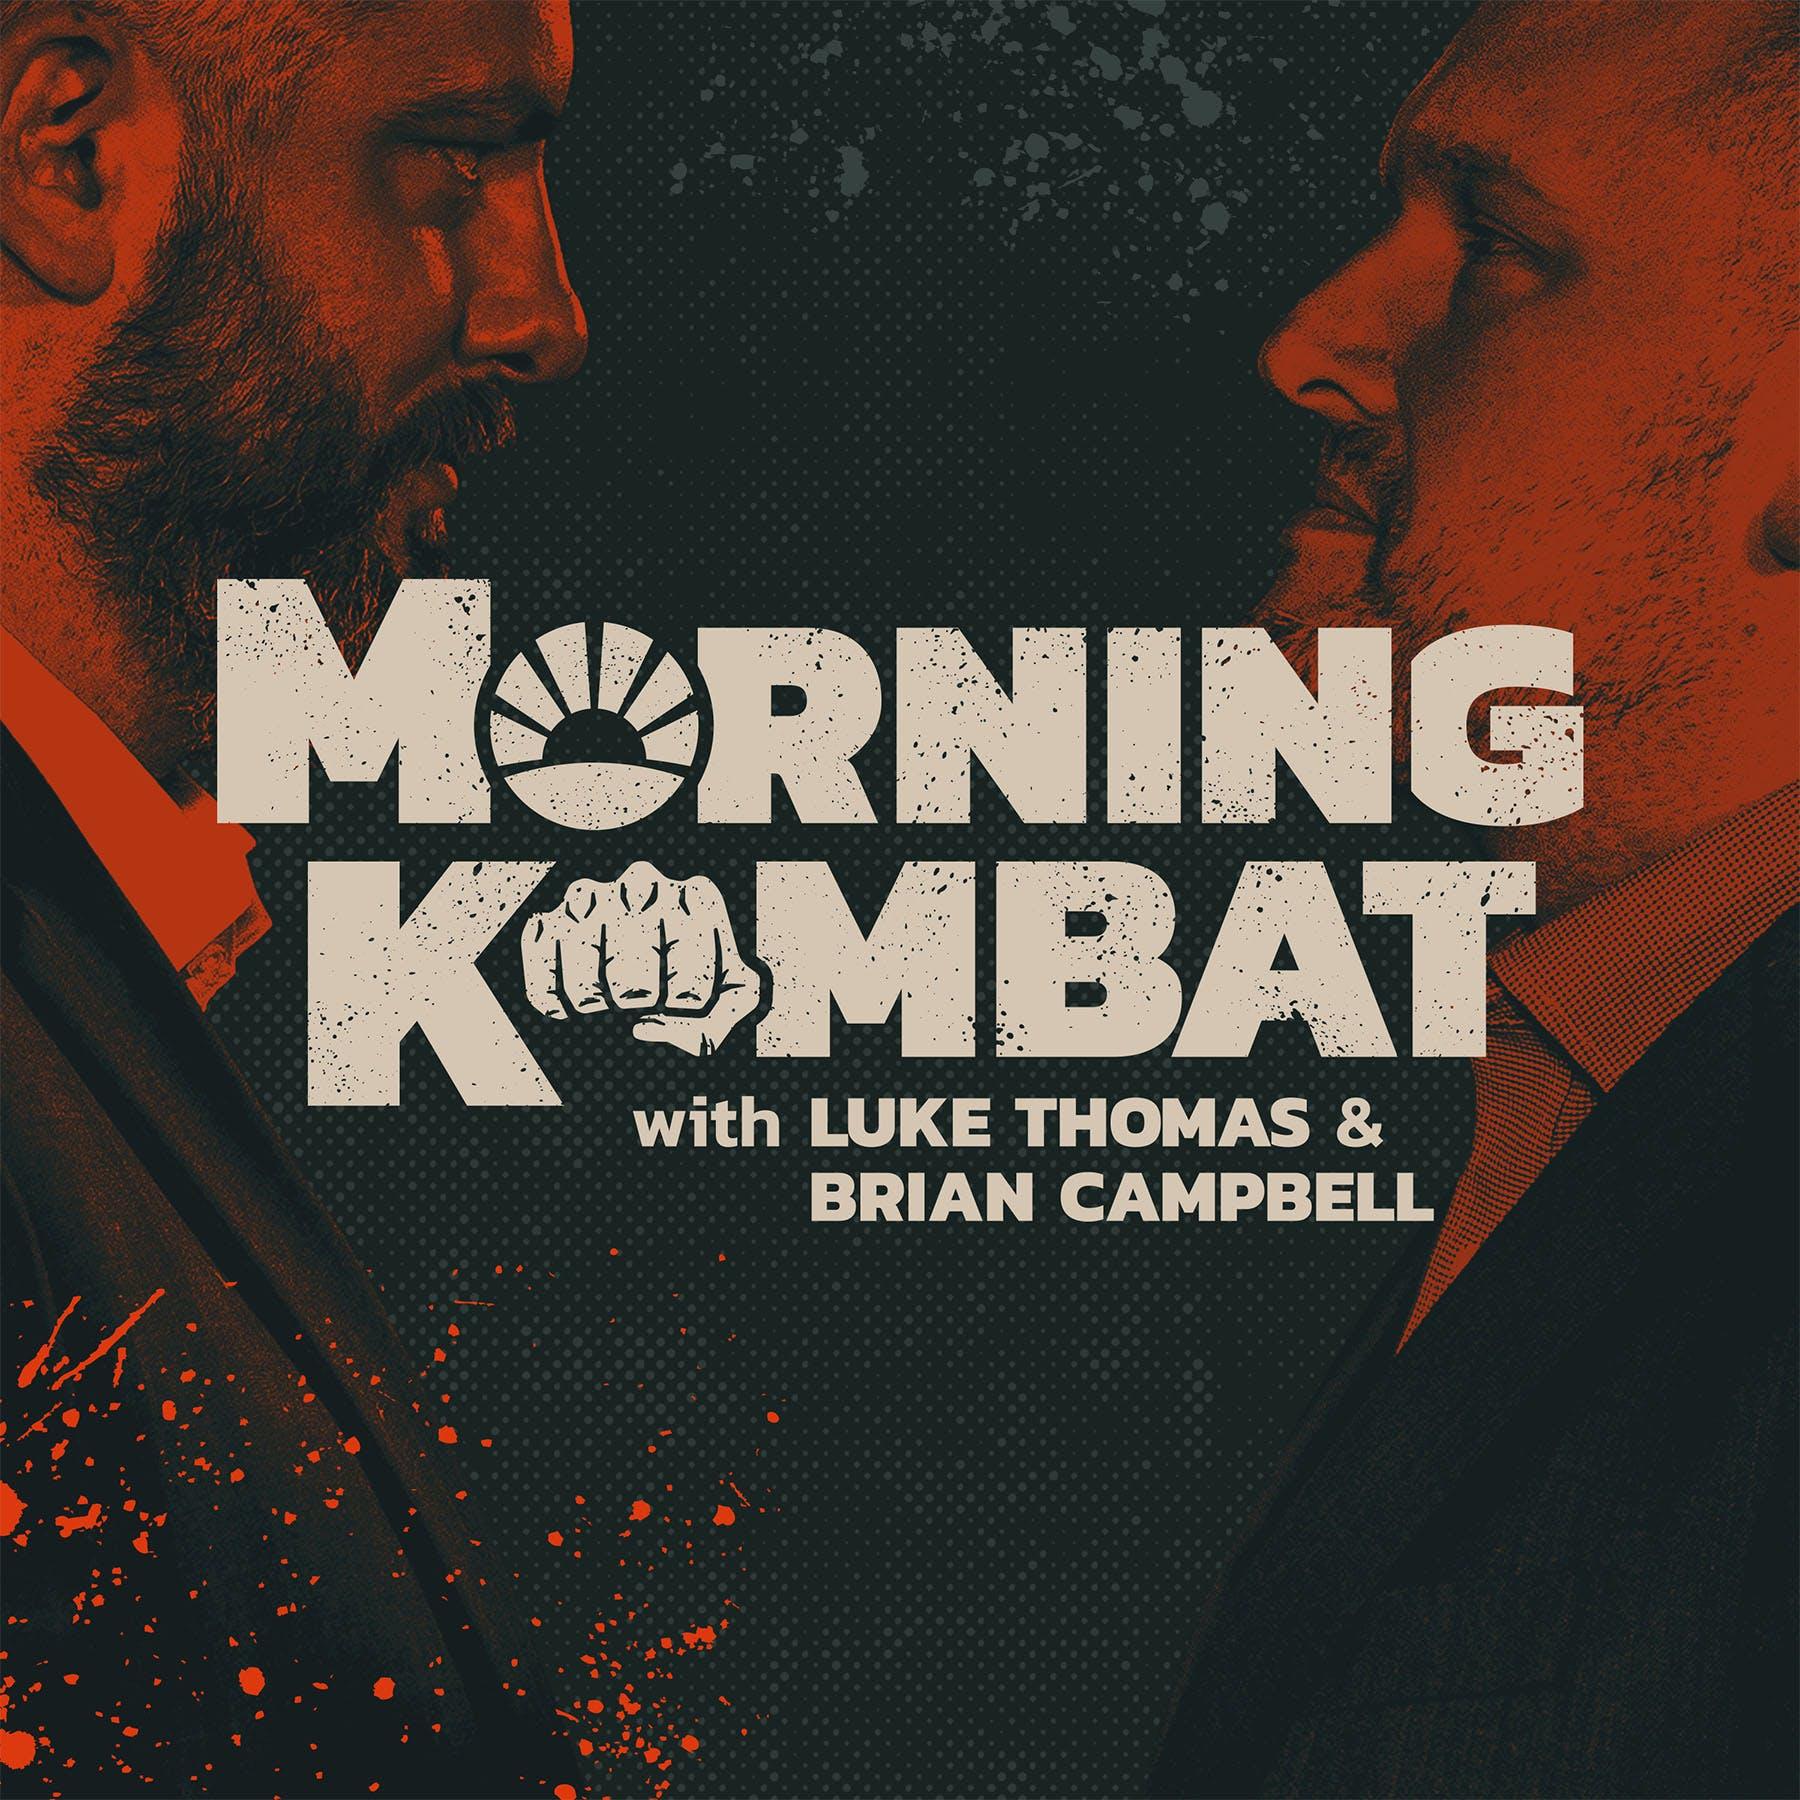 MORNING KOMBAT WITH LUKE THOMAS AND BRIAN CAMPBELL